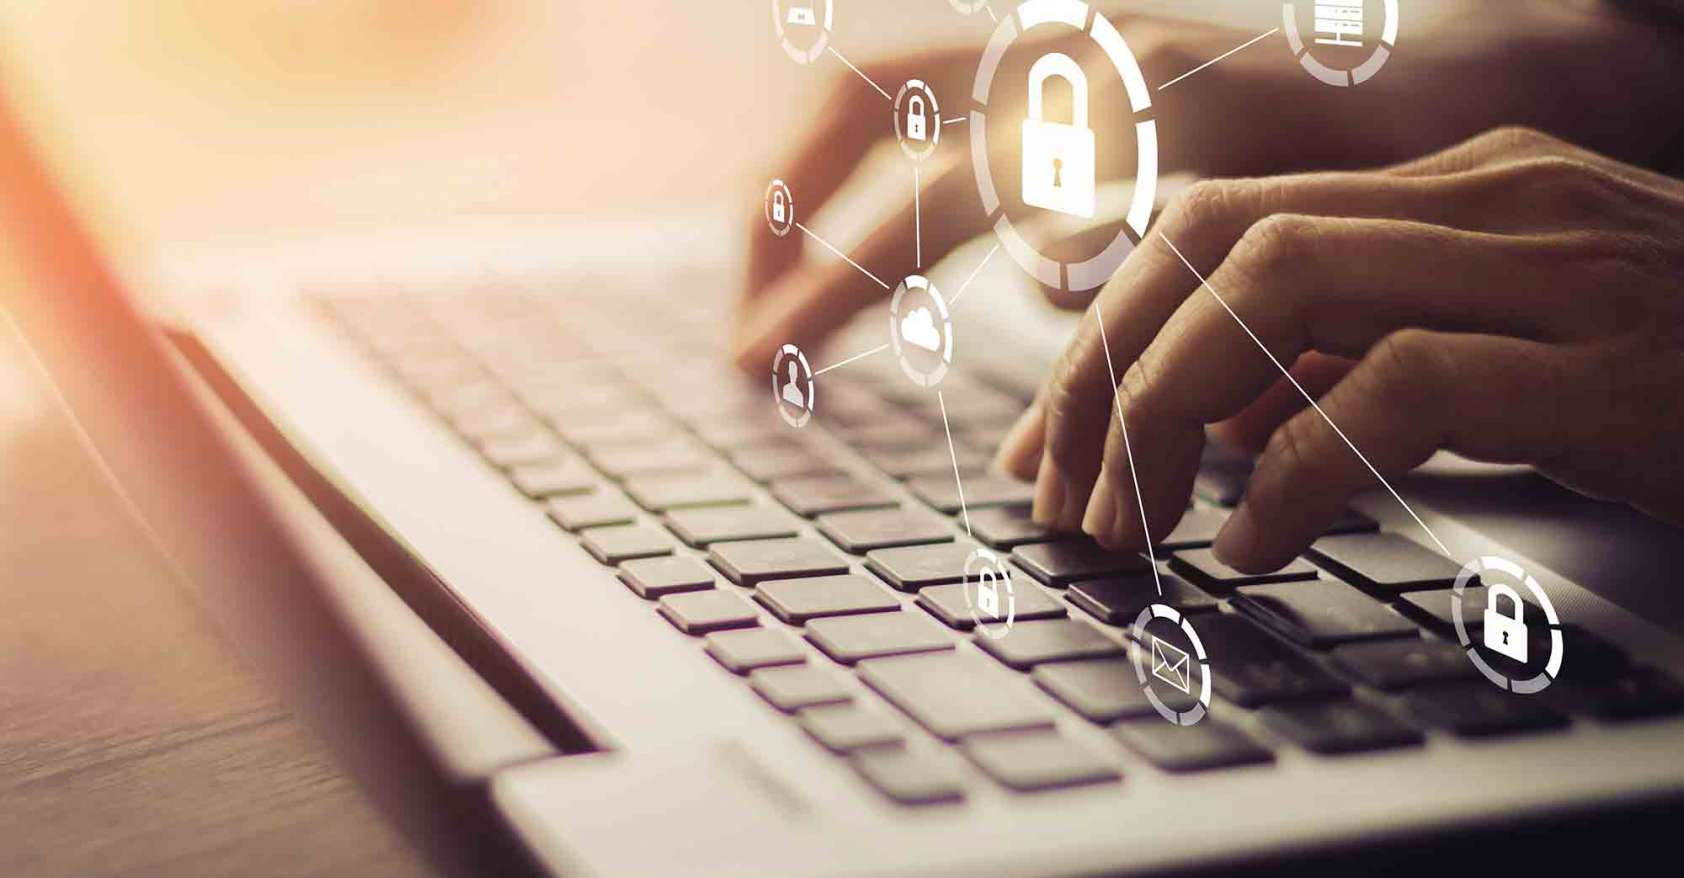 hands on keyboard, Business technology internet networking, GDPR